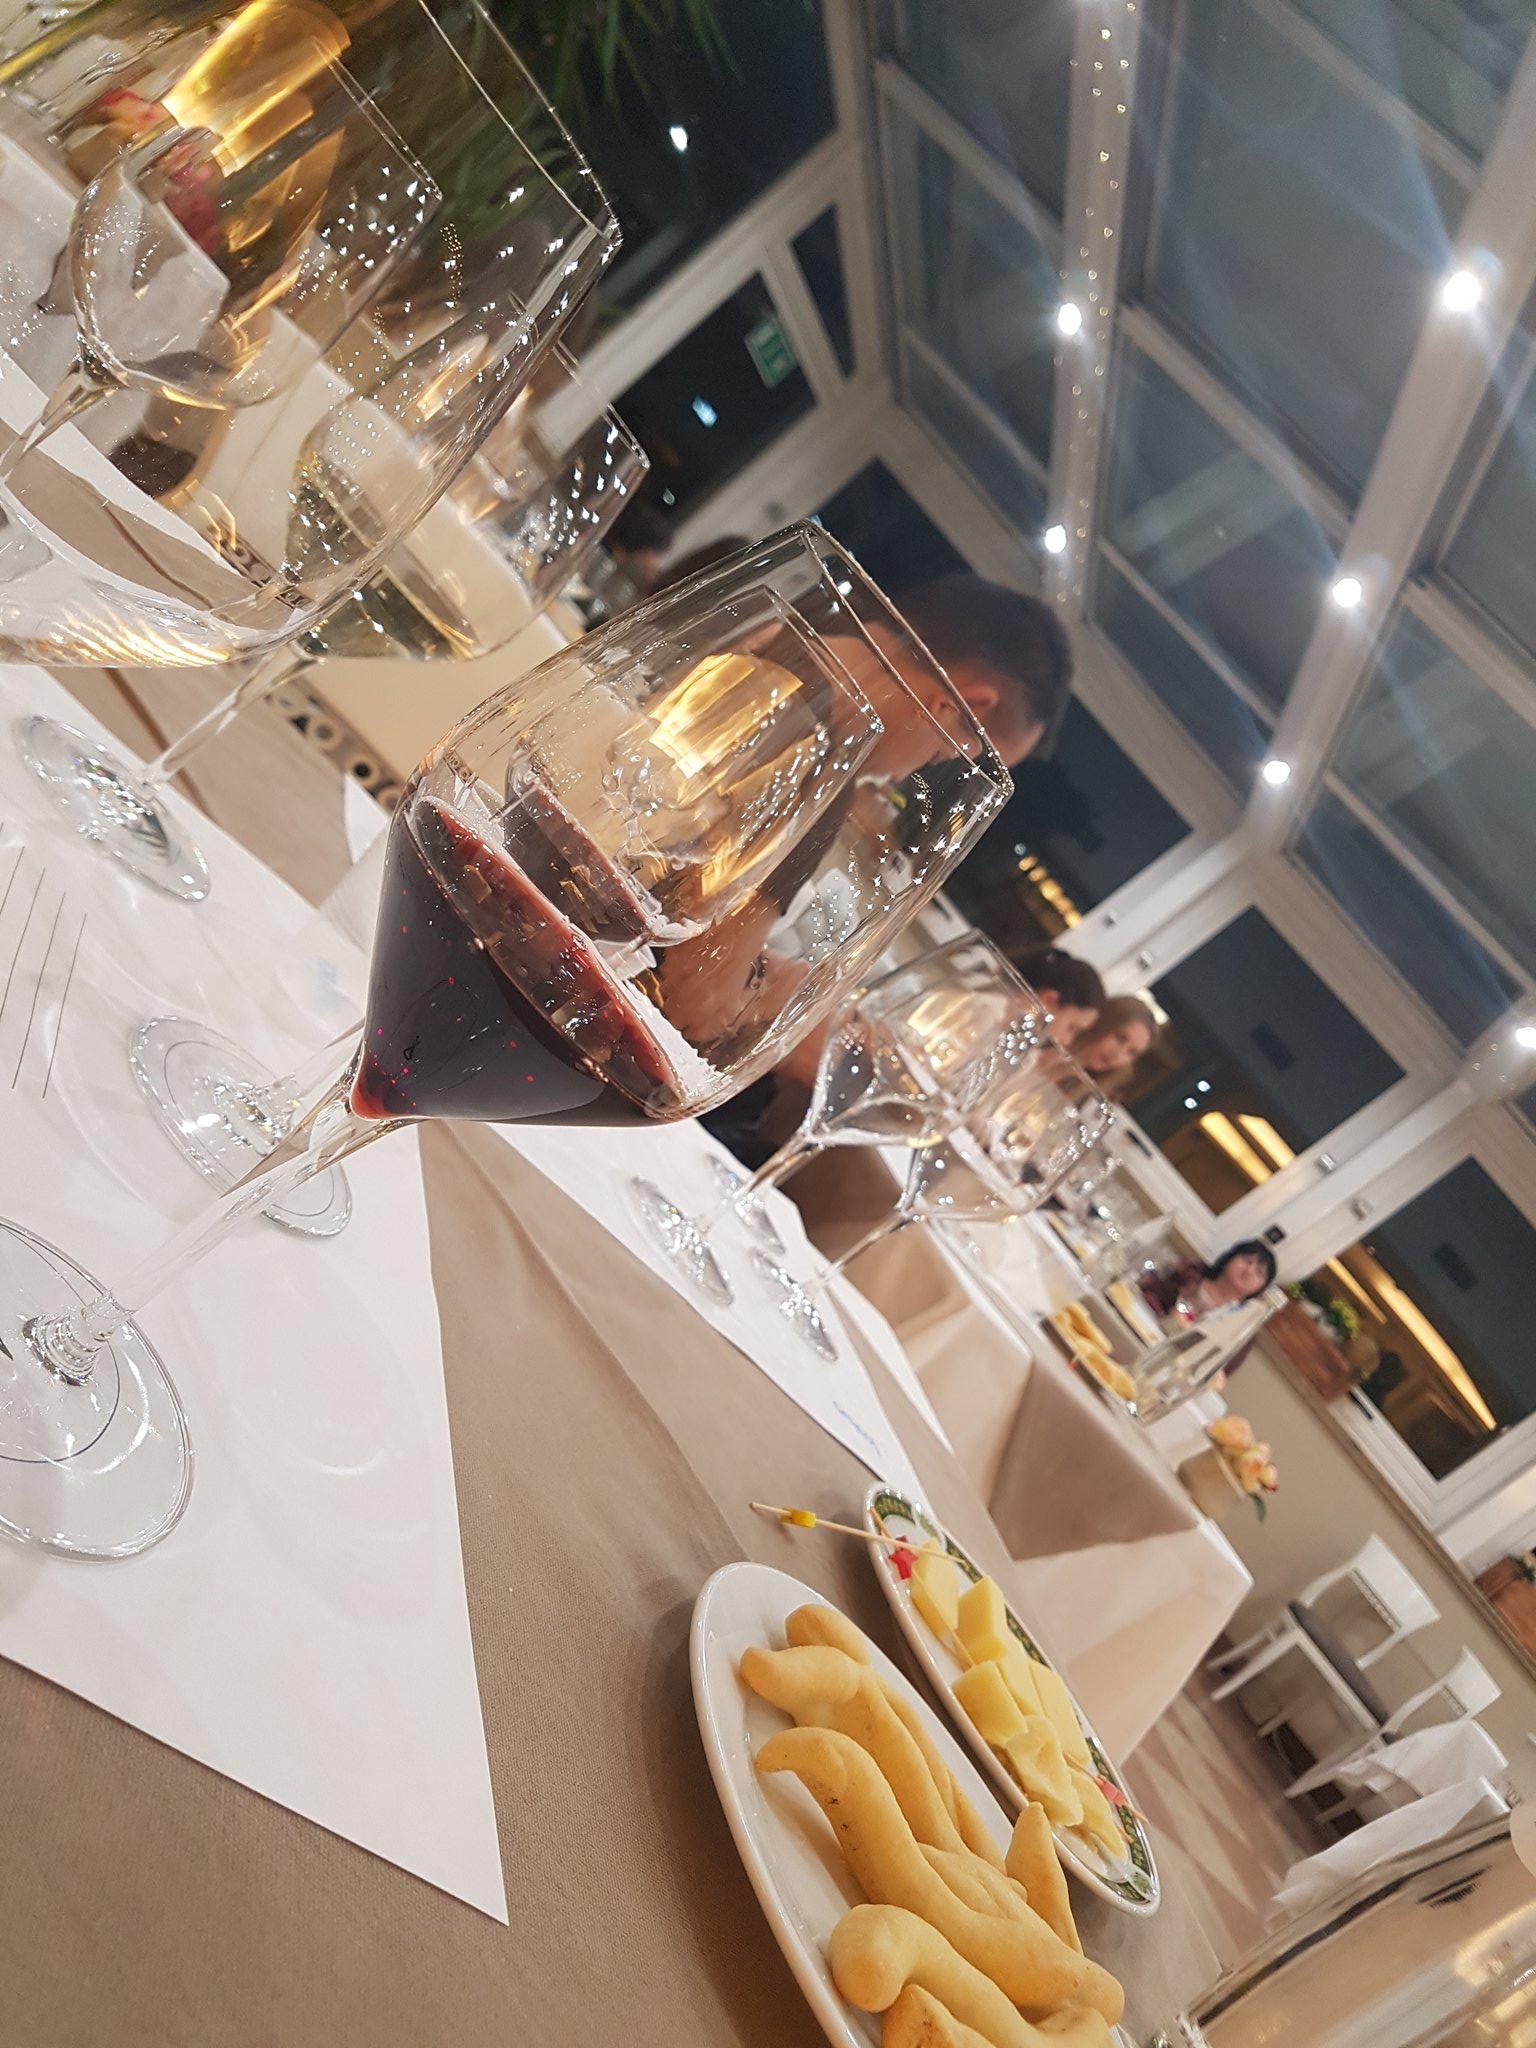 Dai #ColliEuganei al veronese con il #ValpolicellaRipasso #WineTastingEmotions #winetasting #wine